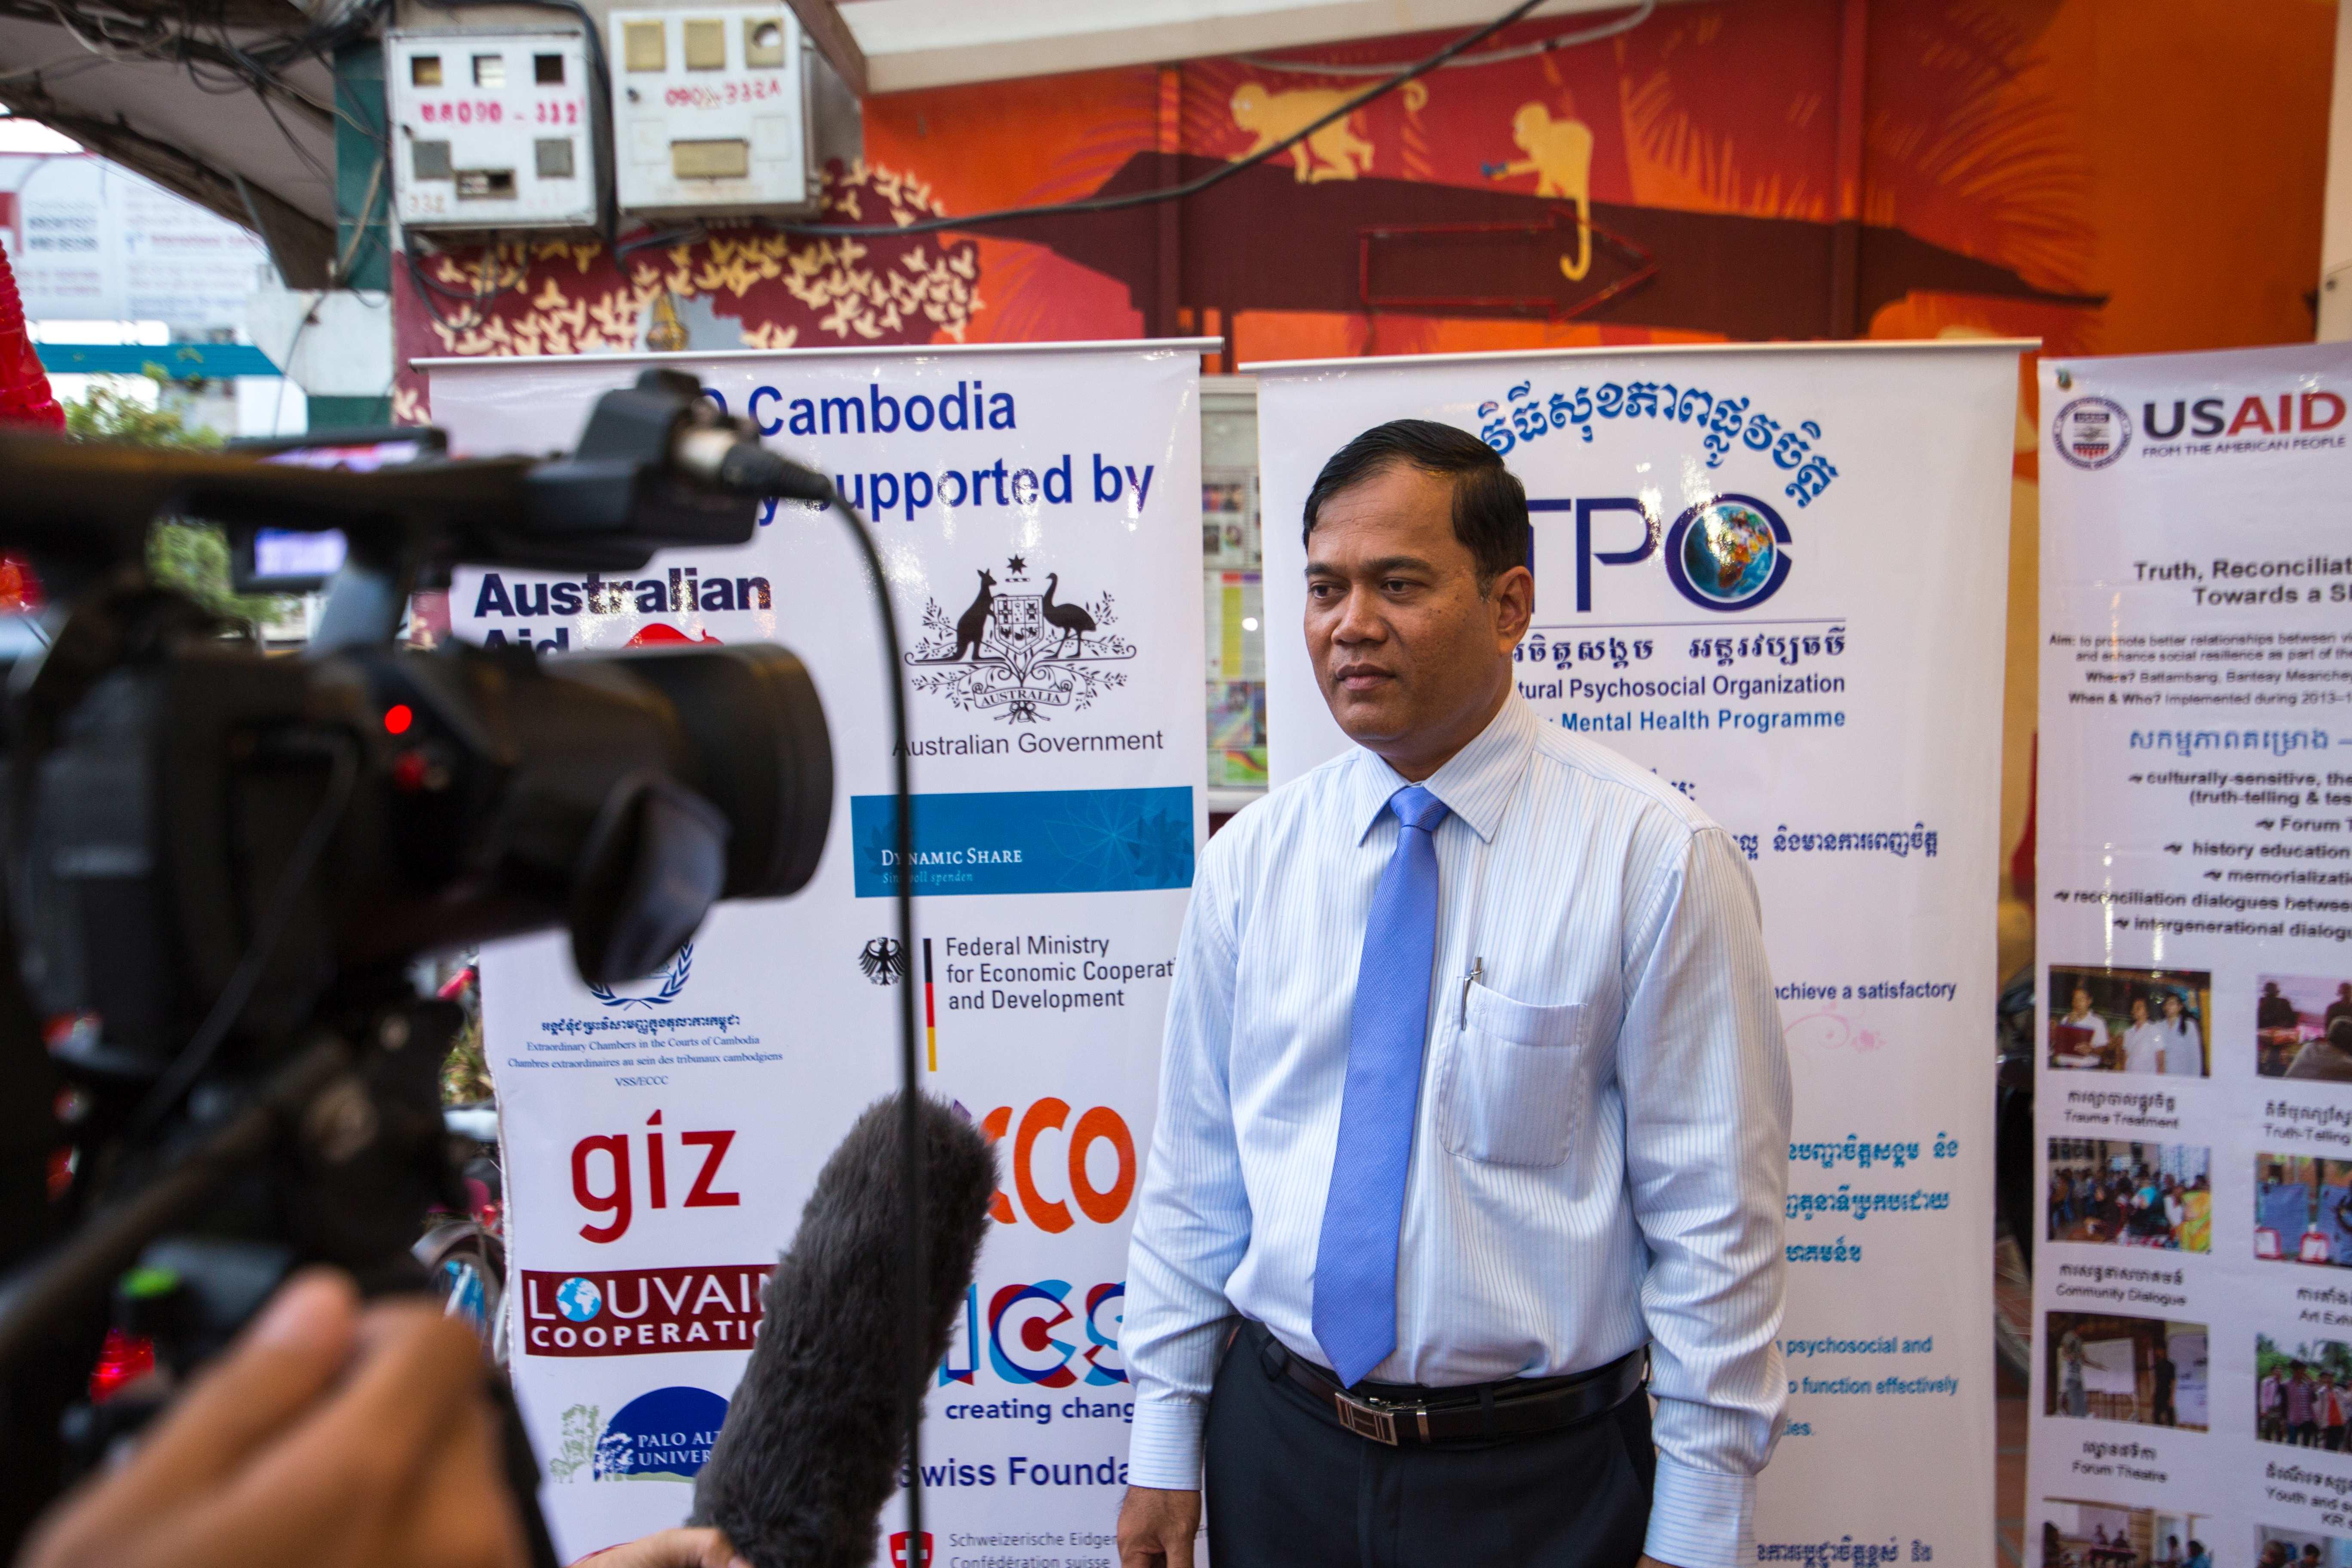 3. A Journalist interviews Dr. Chhim Sotheara, TPO Executive Director